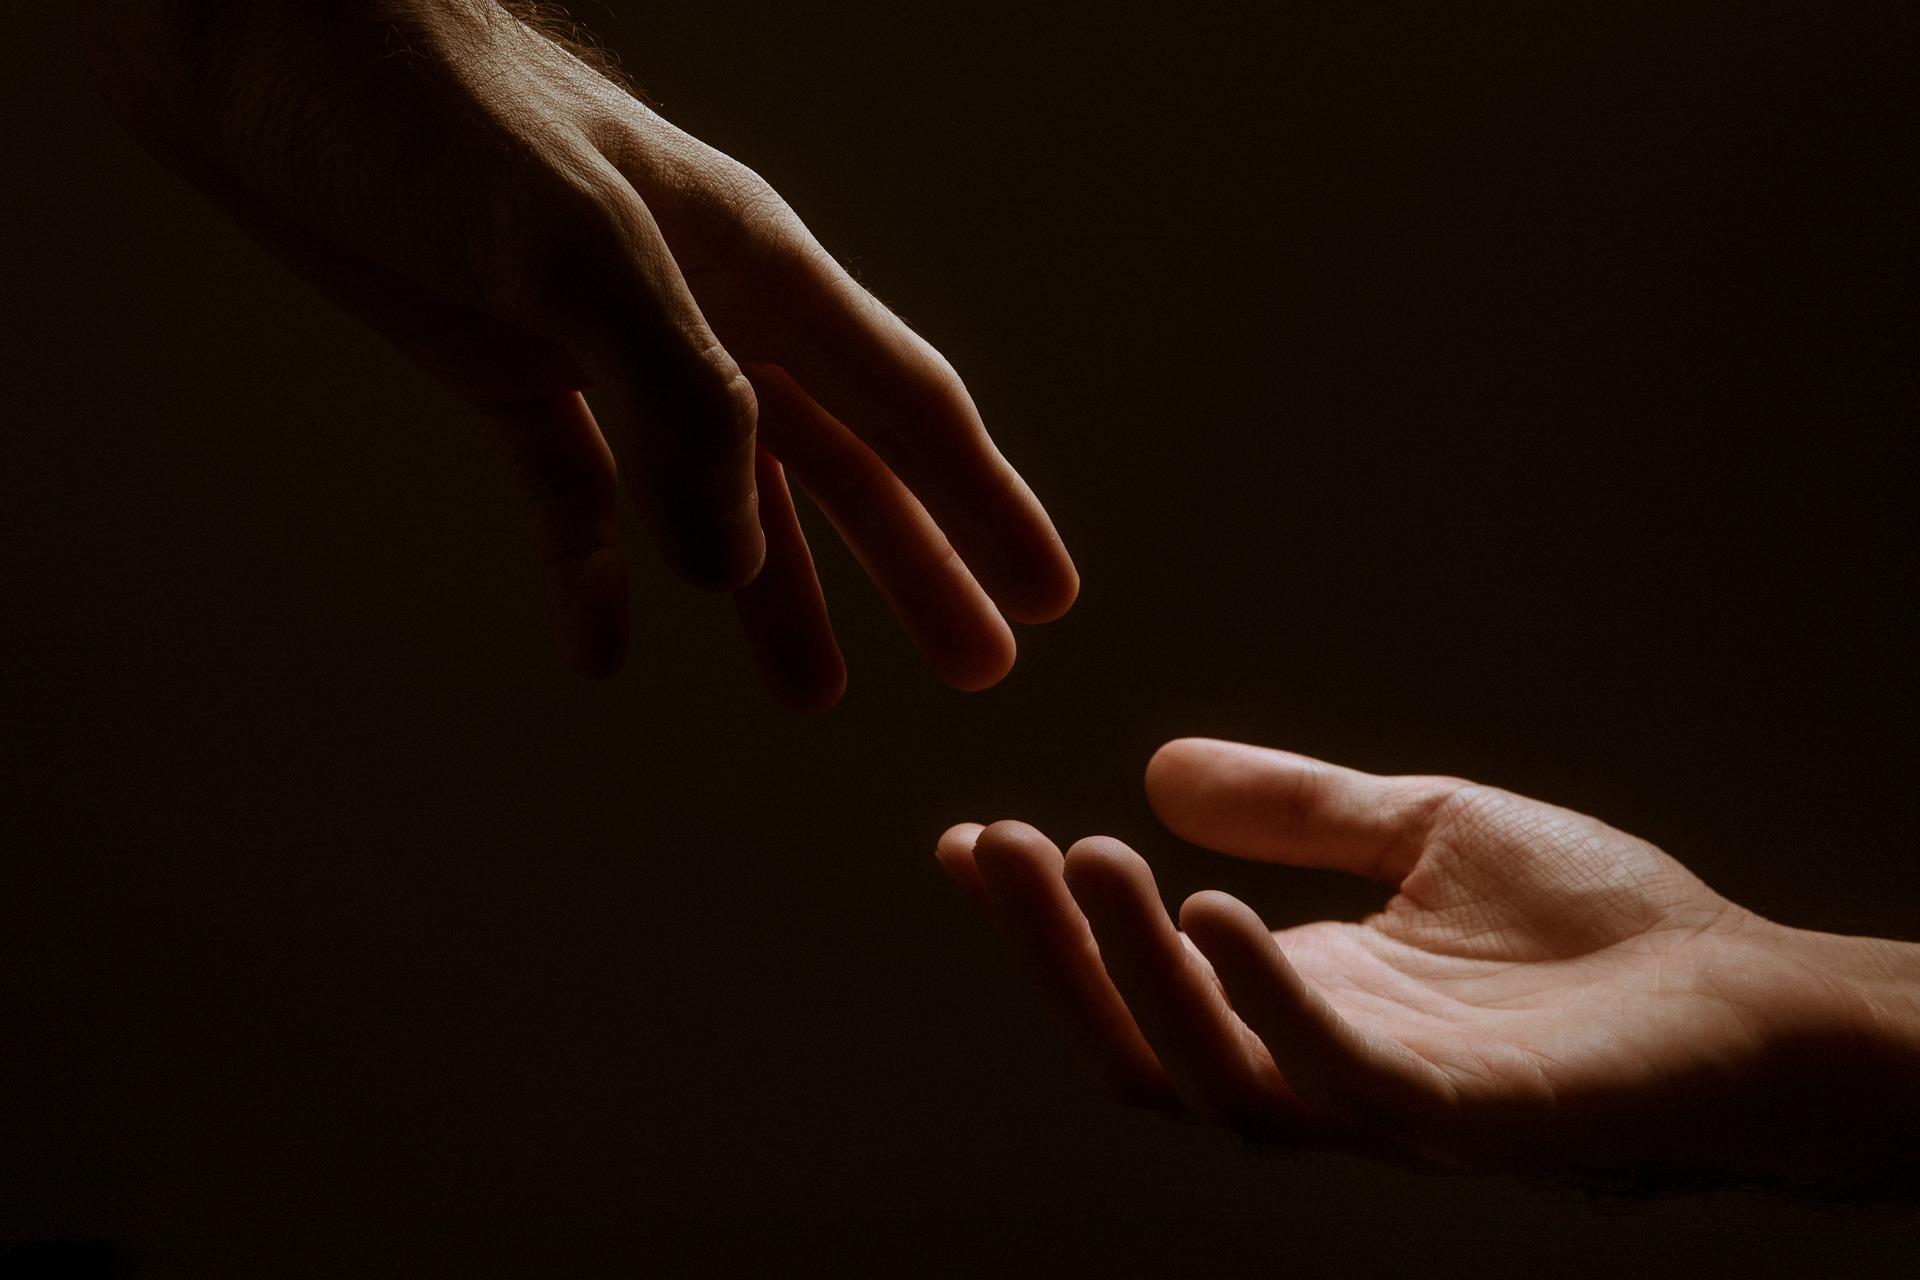 vulnerability-prayer-hold-me-tight